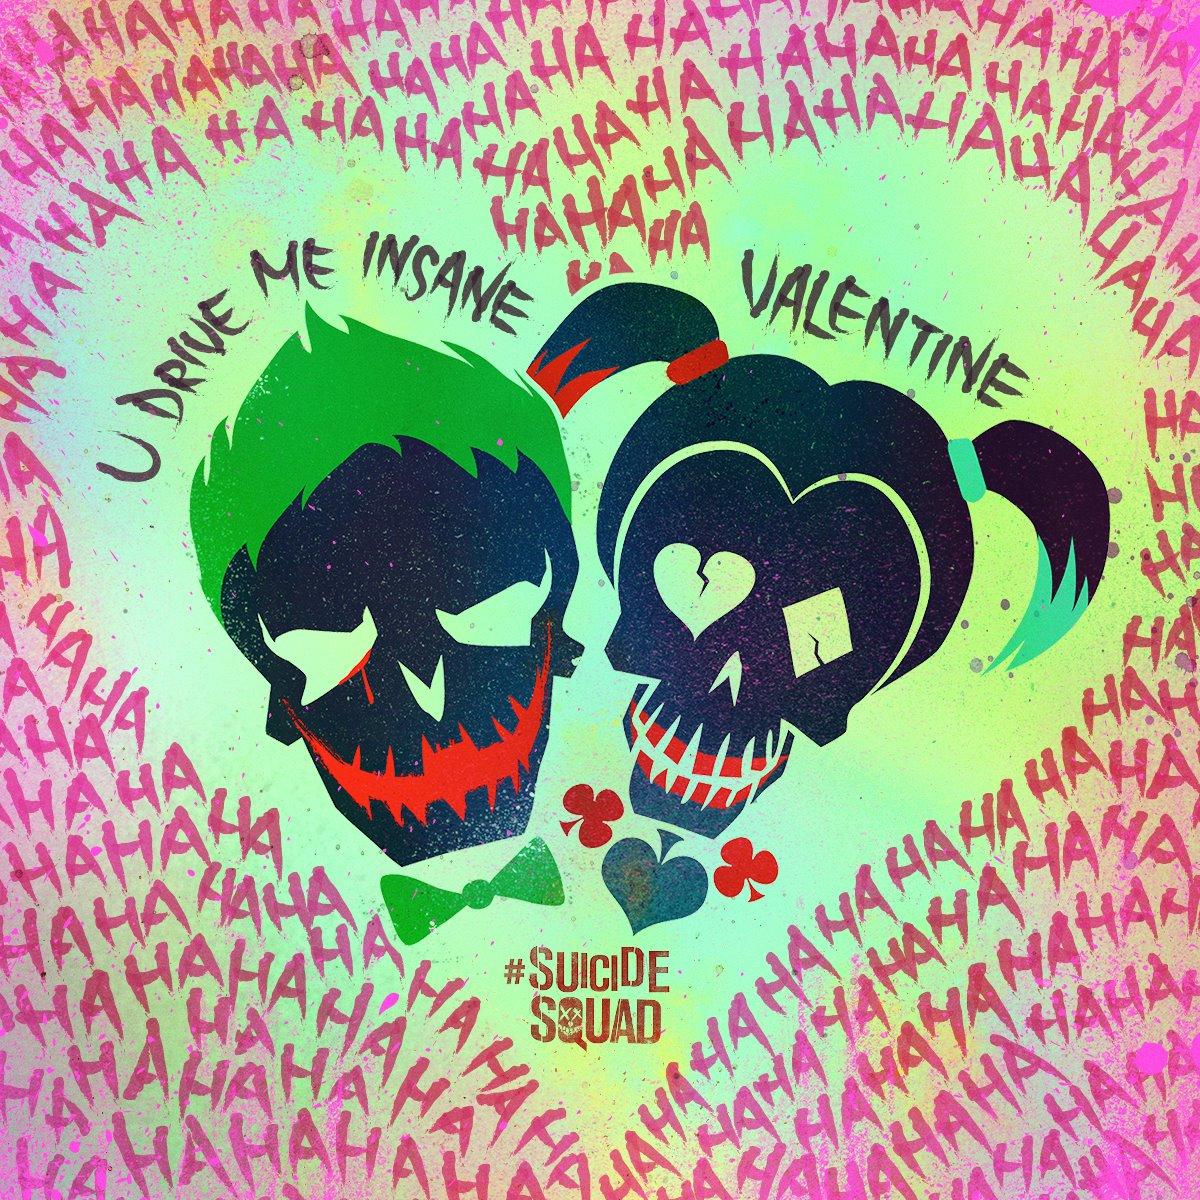 Suicide Squad Asi Celebraron Joker Y Harley Quinn San Valentin